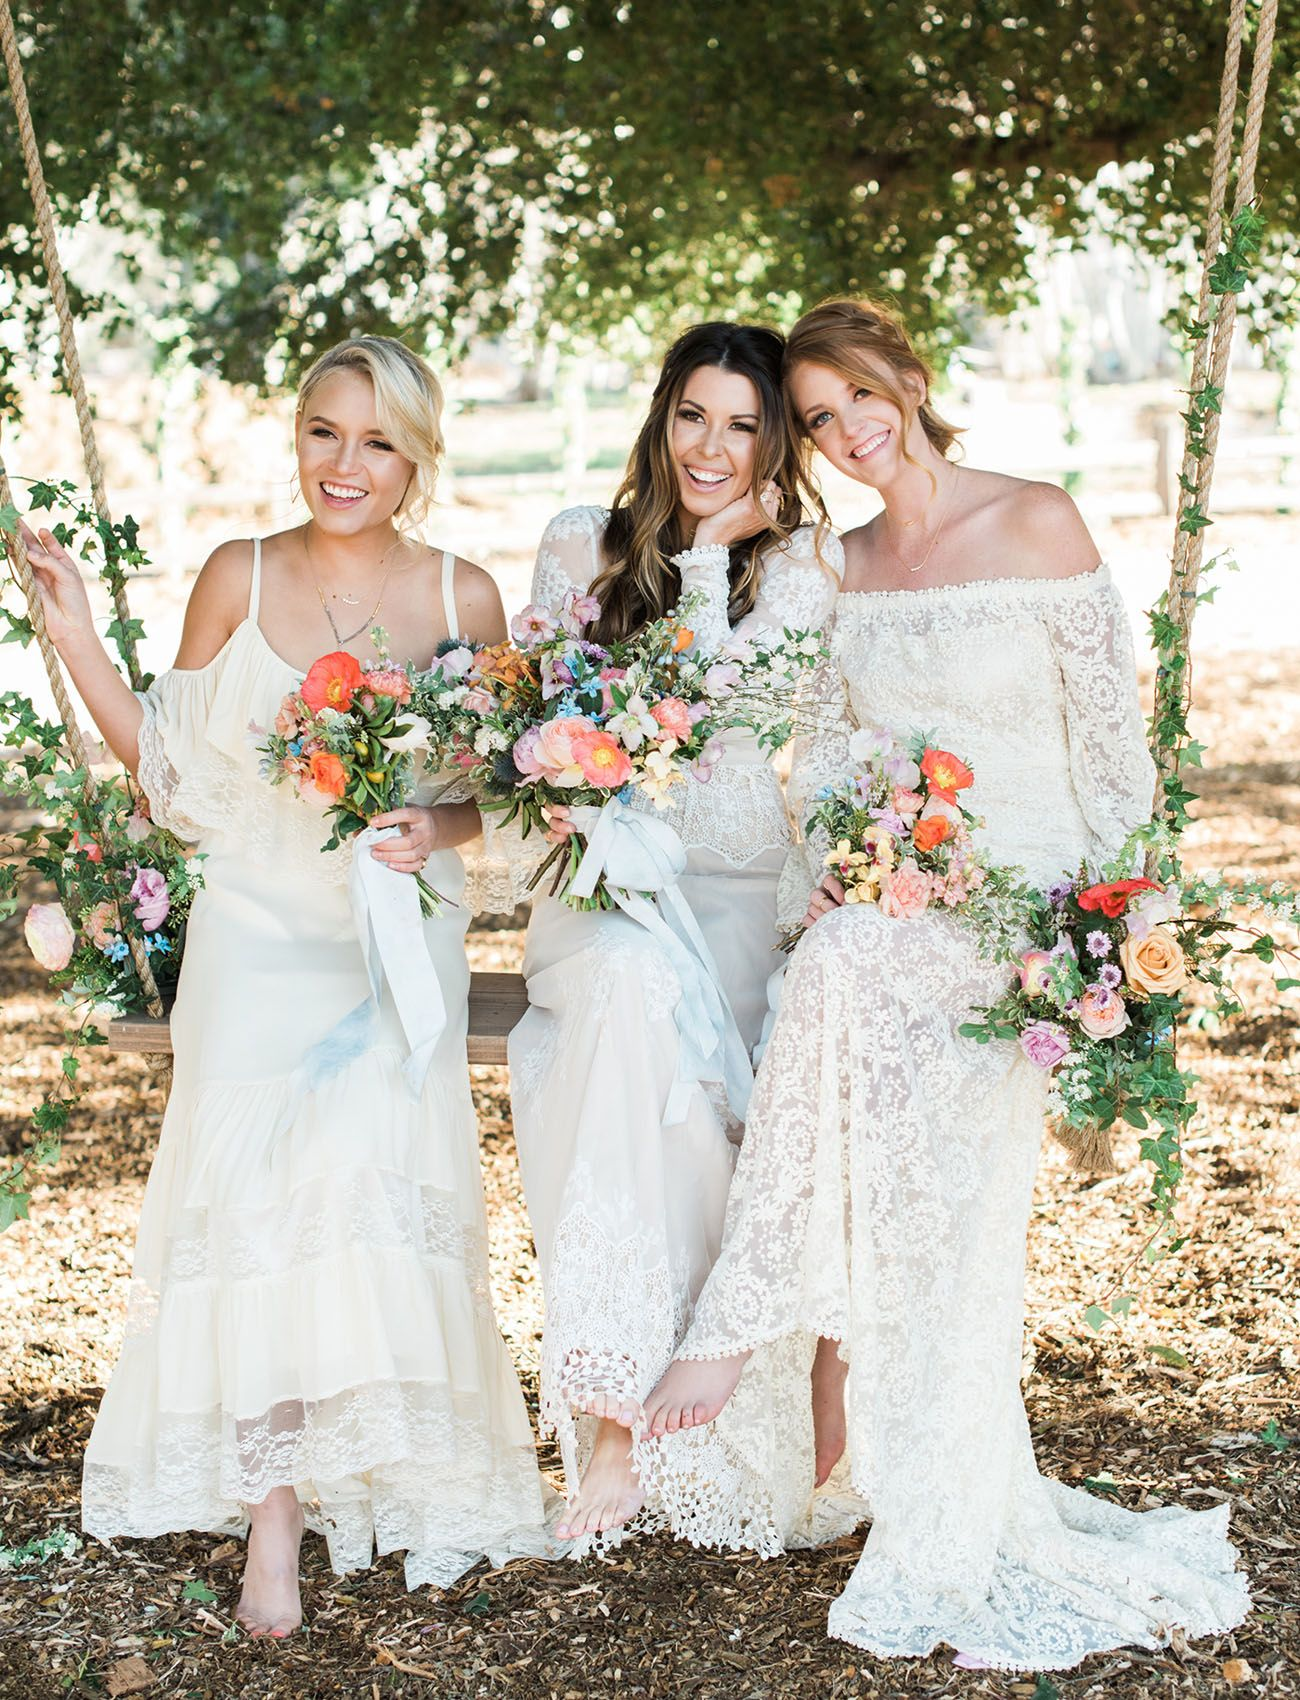 Boho chic meets geode watercolor pastel wedding inspiration